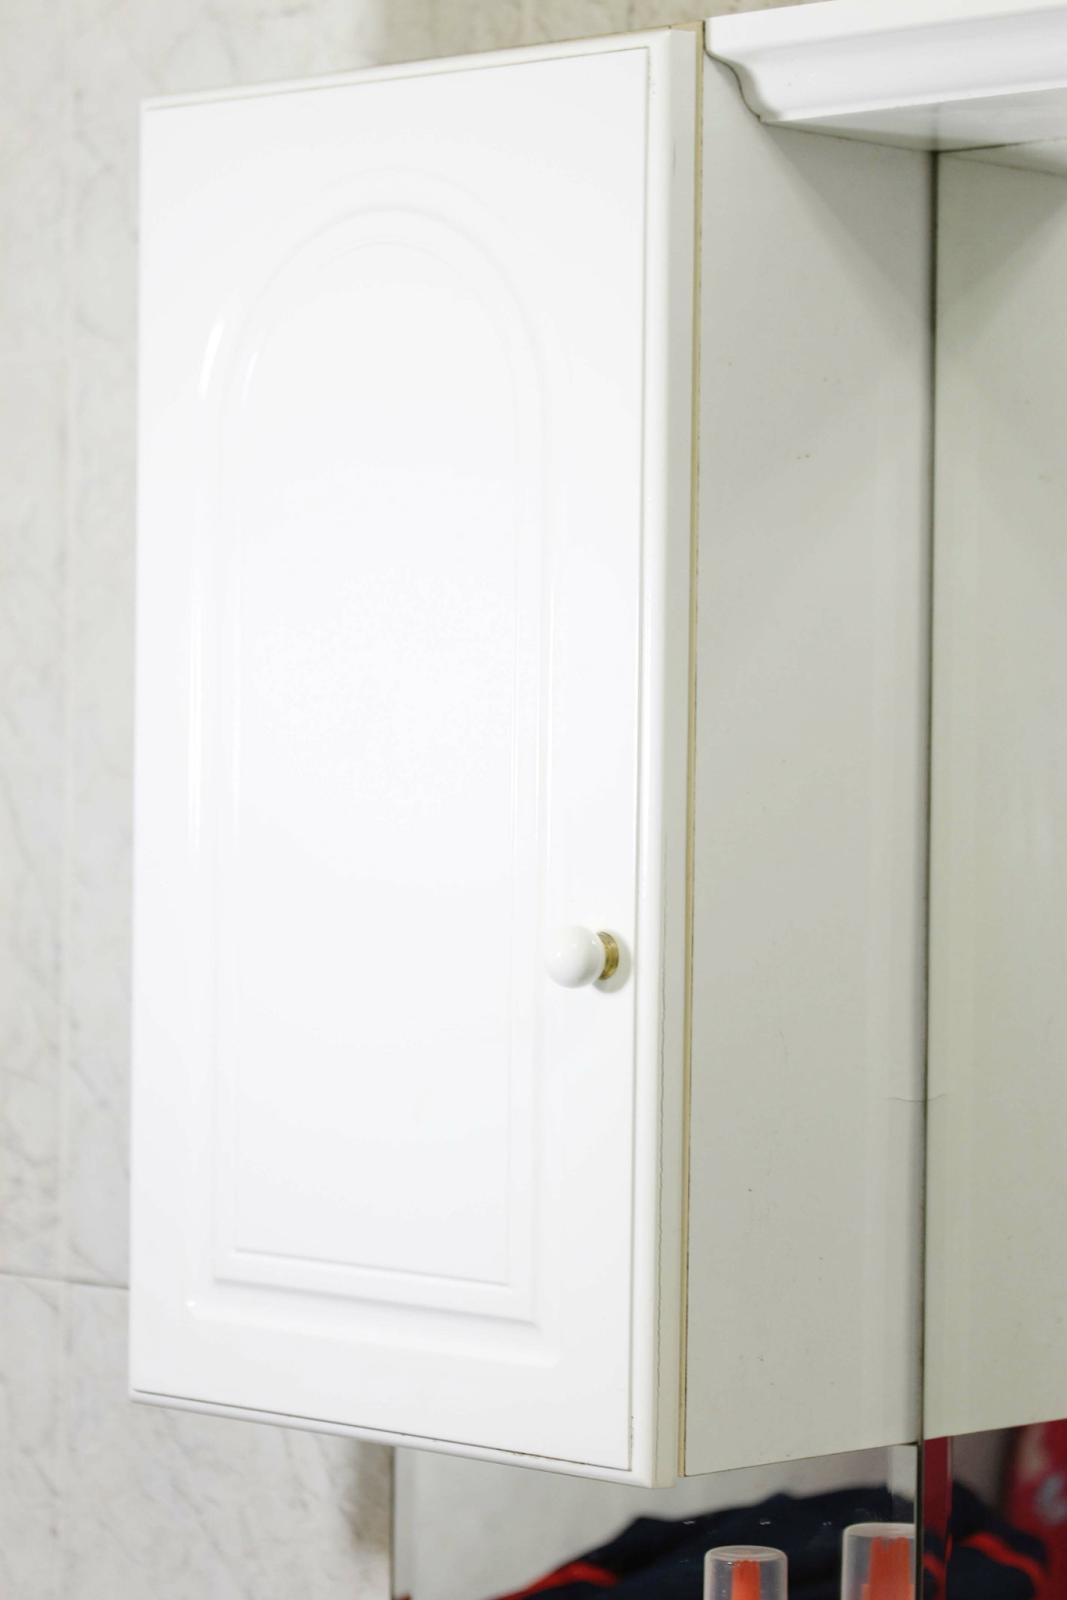 Diy operaci n orden en casa mini percheros para mini for Perchas adhesivas para puertas